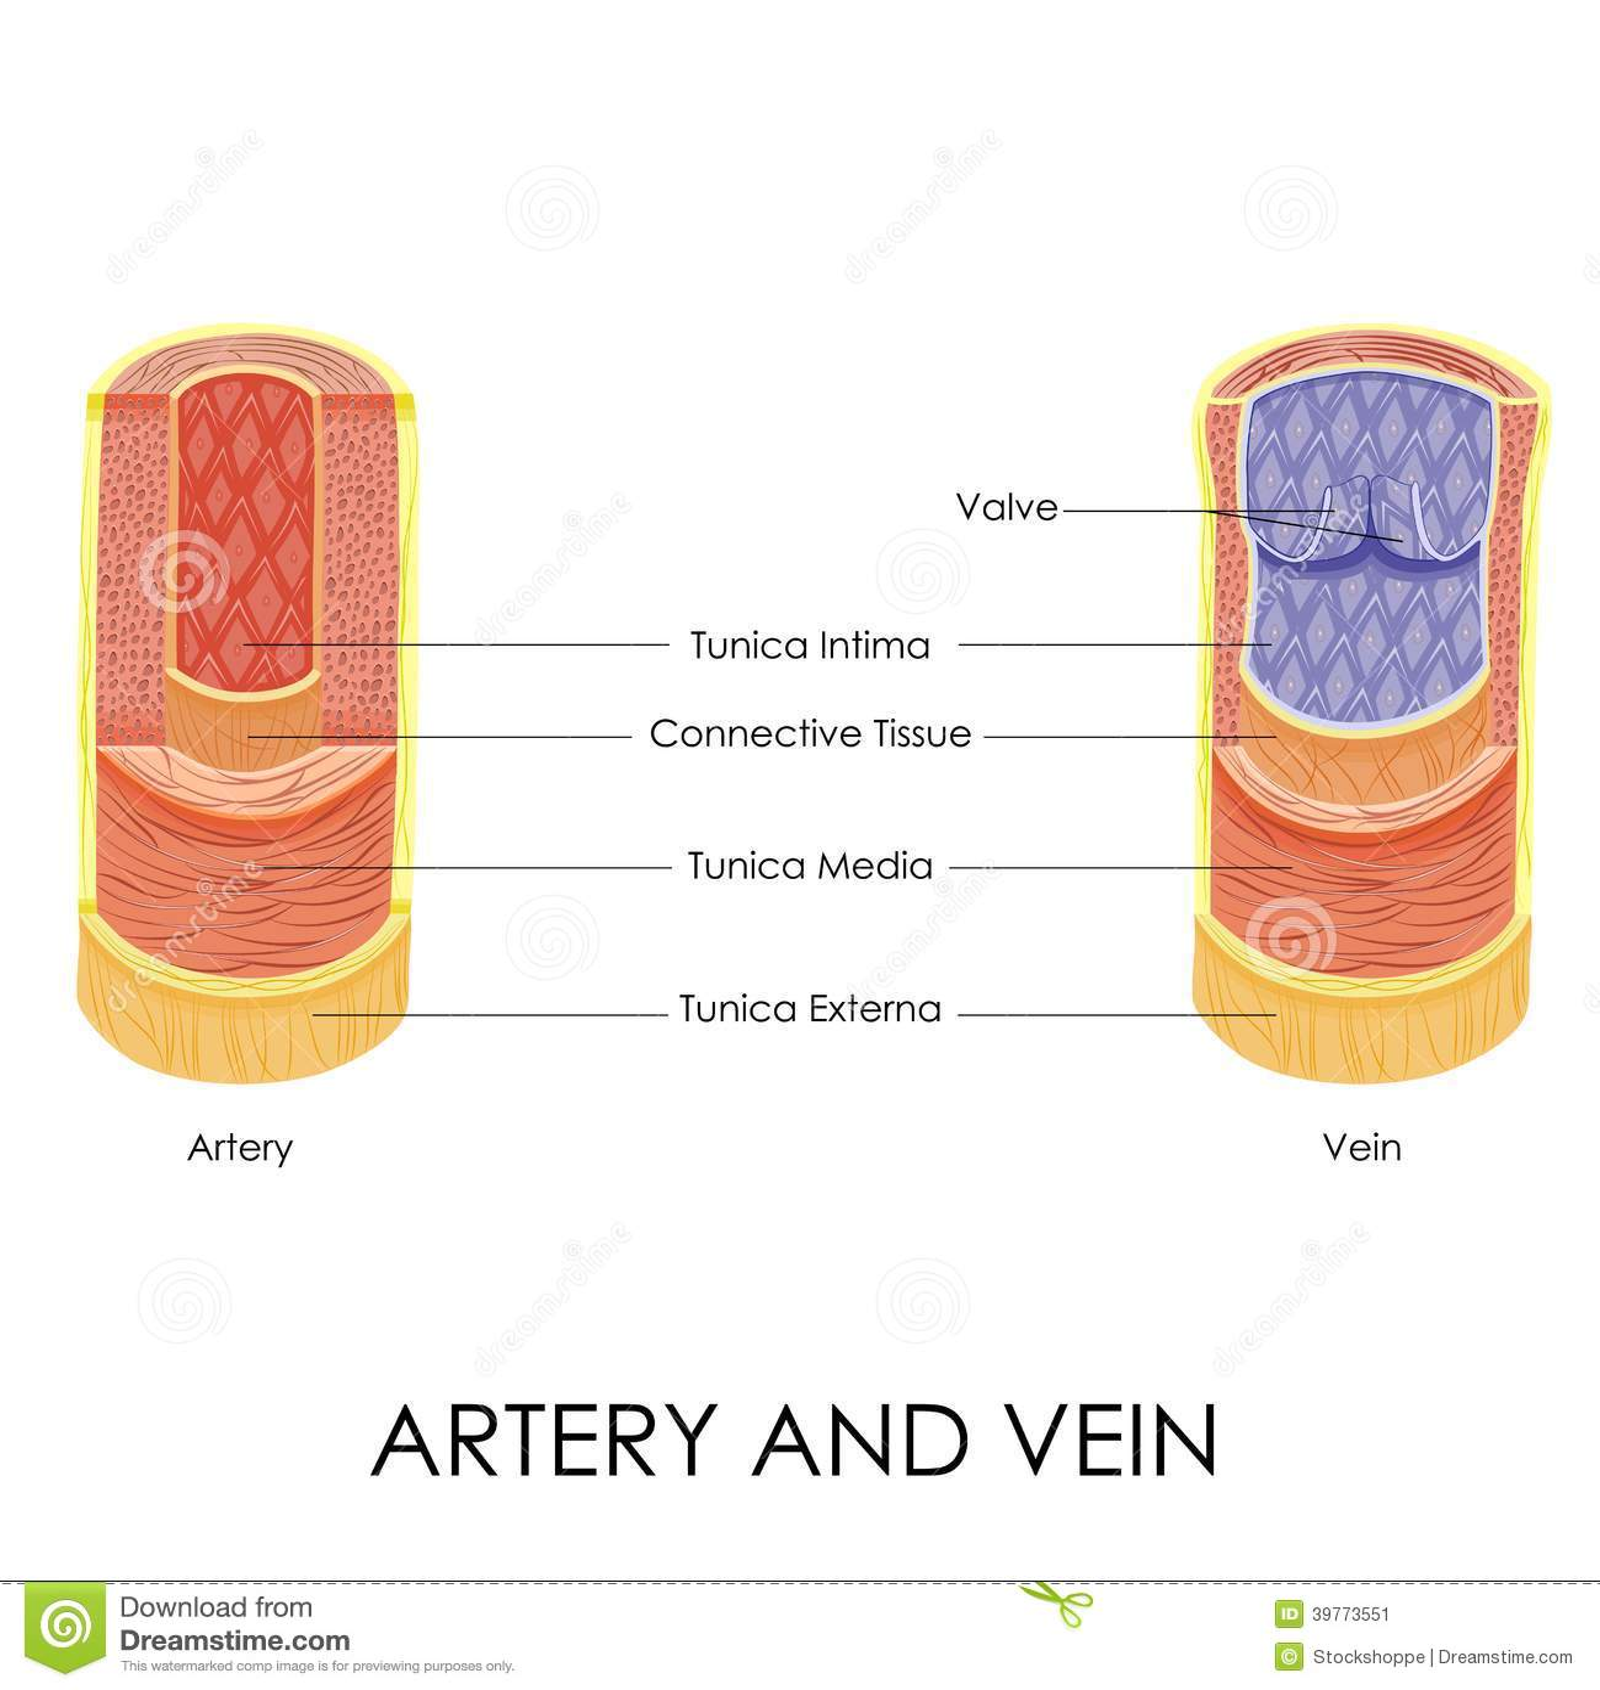 Artery And Vein Stock Vector Illustration Of Blood Intima 39773551